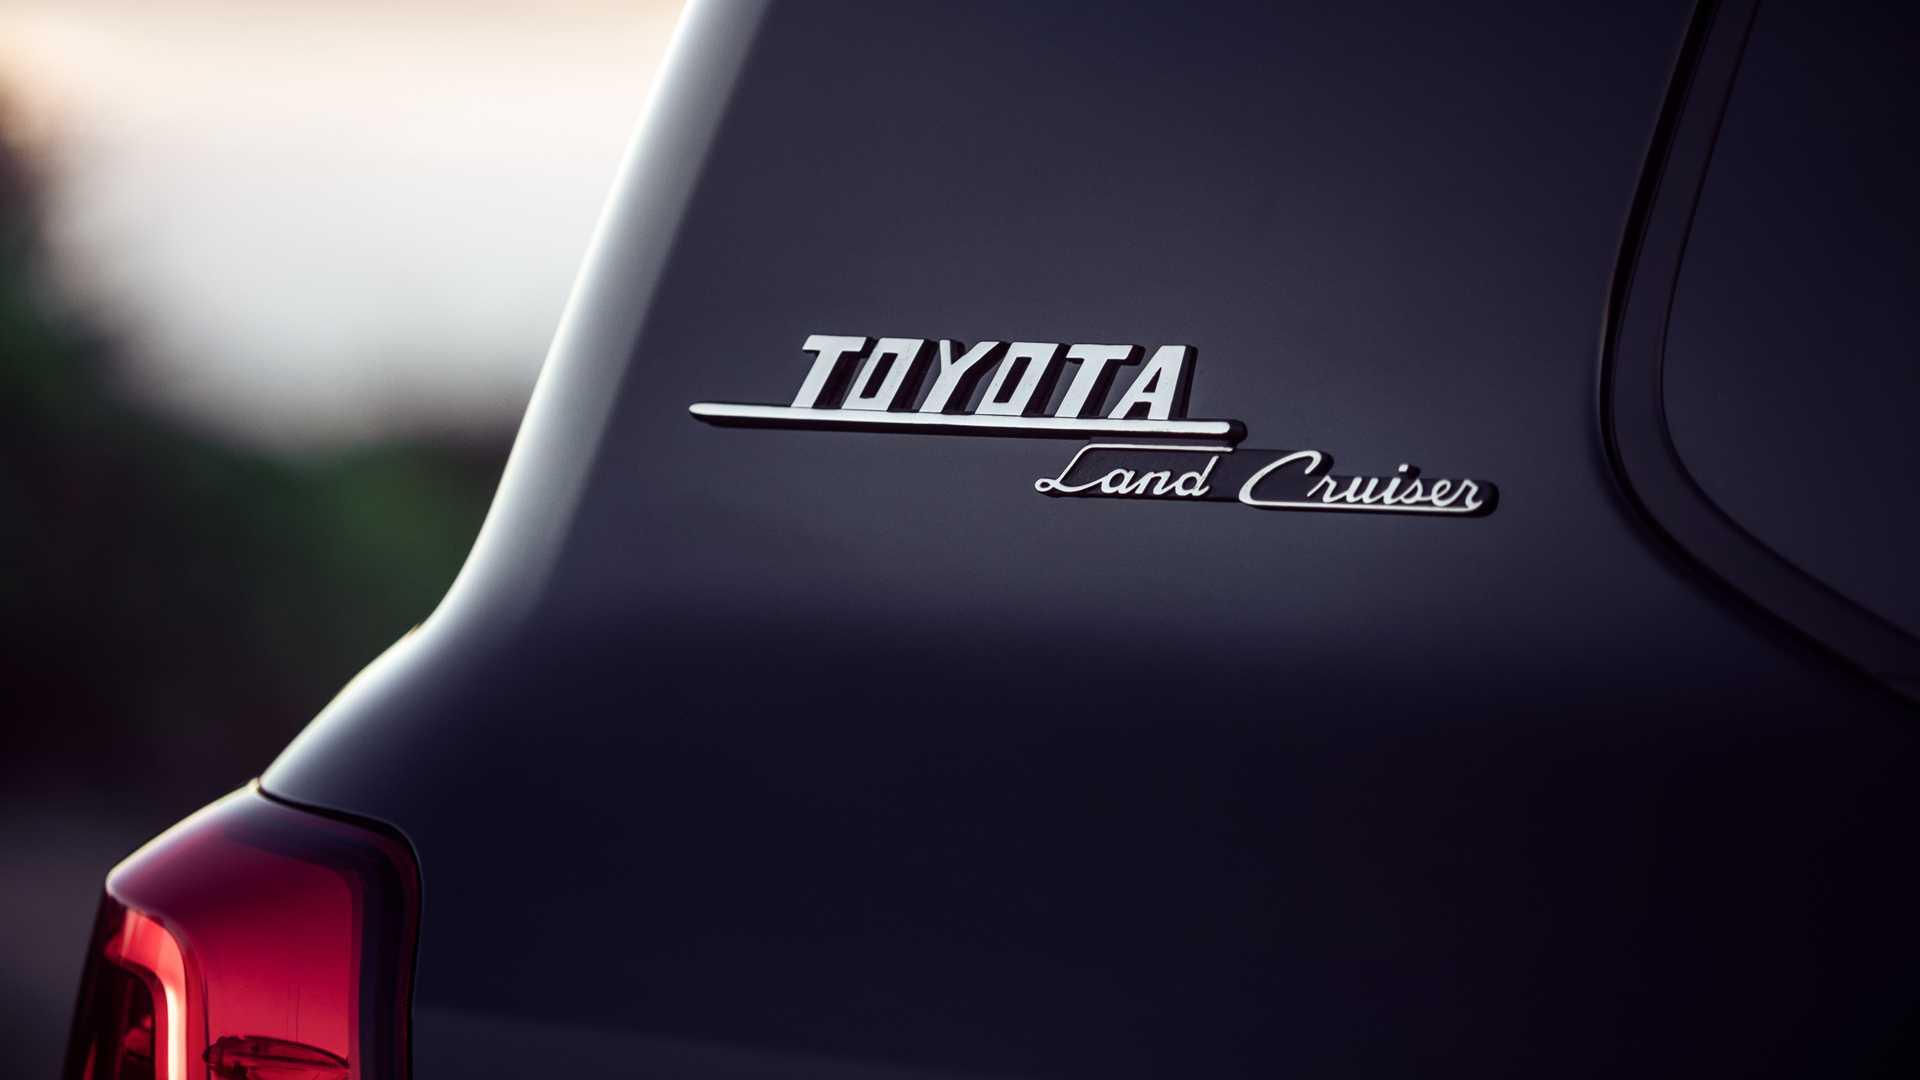 2020-toyota-land-cruiser-heritage-edition (4)